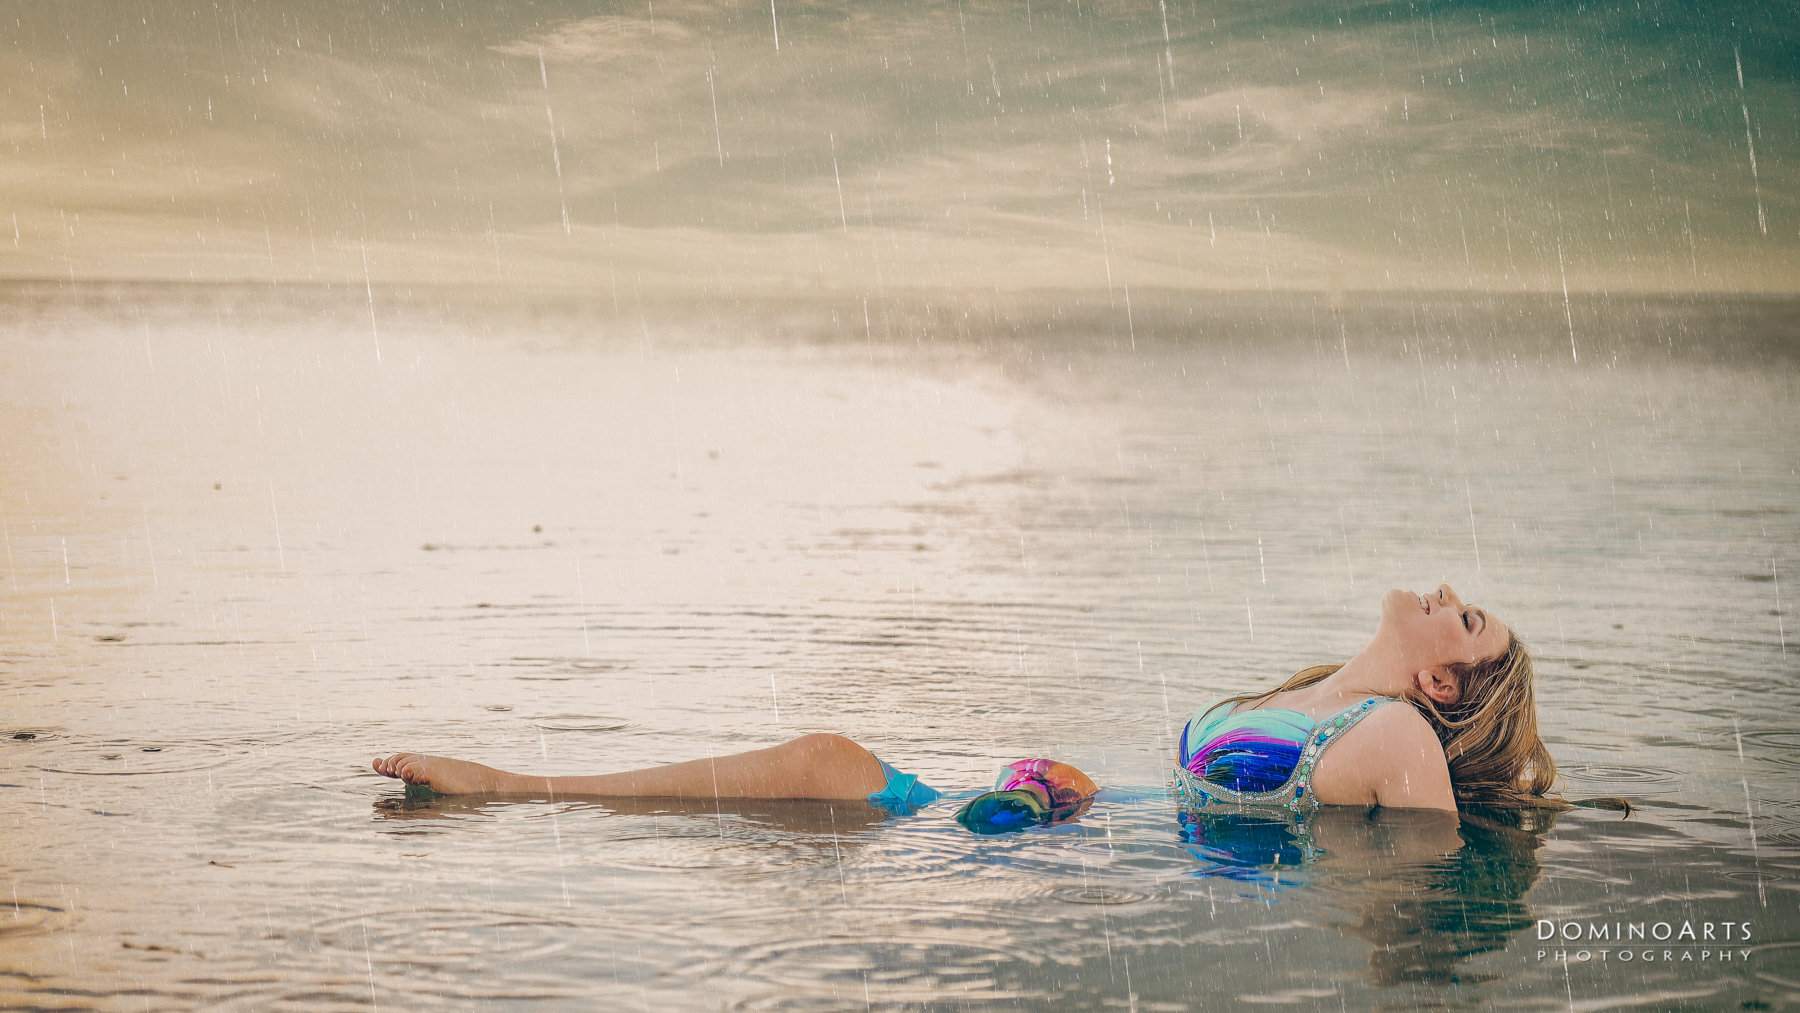 Rain model luxury photography south beach miami